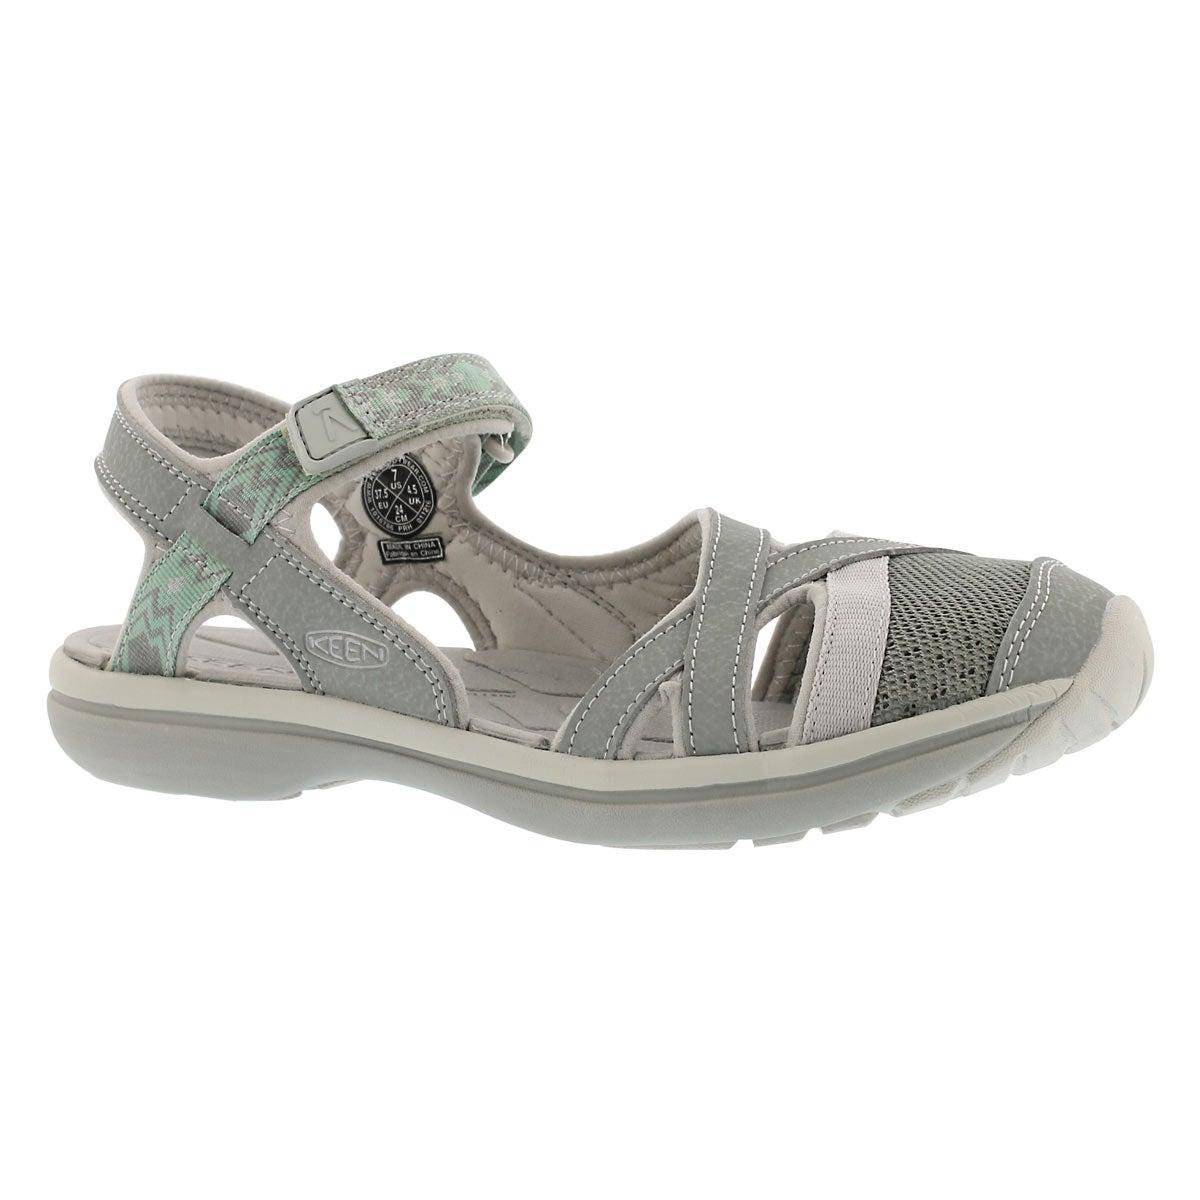 Women's SAGE ANKLE neutral/grey sport sandals